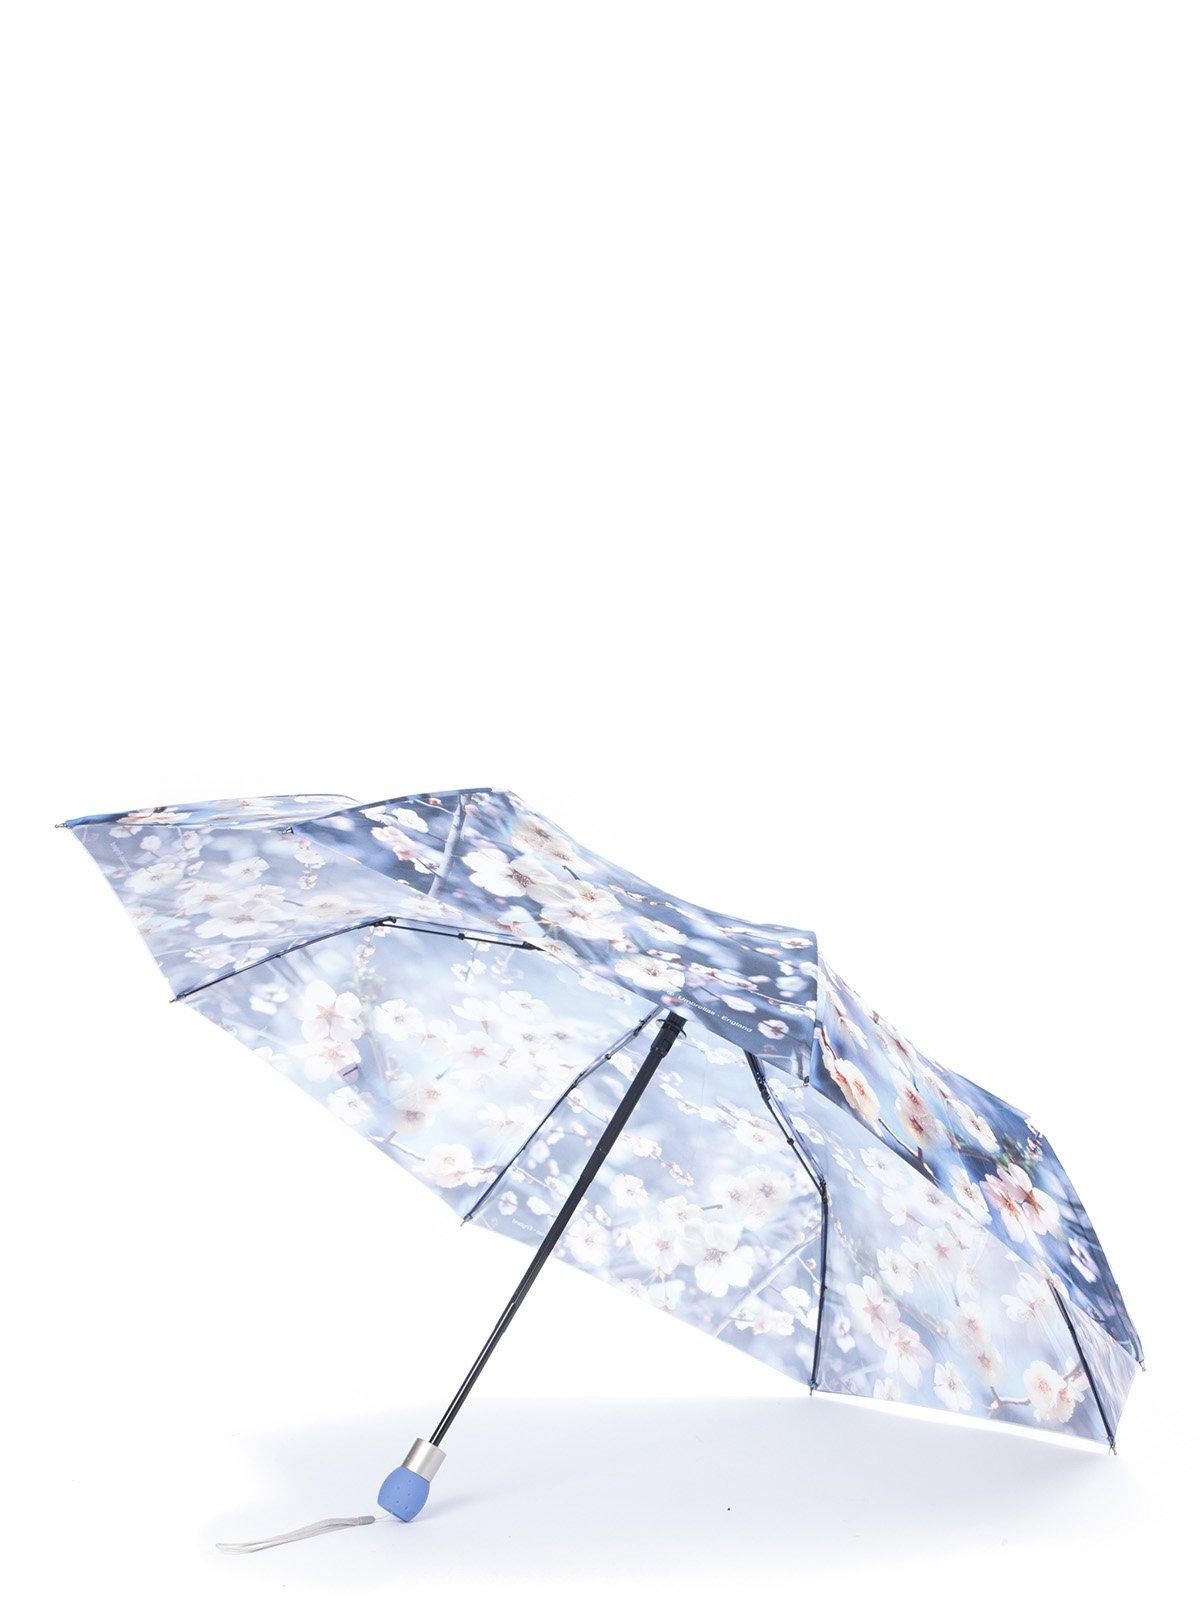 Зонт-полуавтомат | 1019540 | фото 2